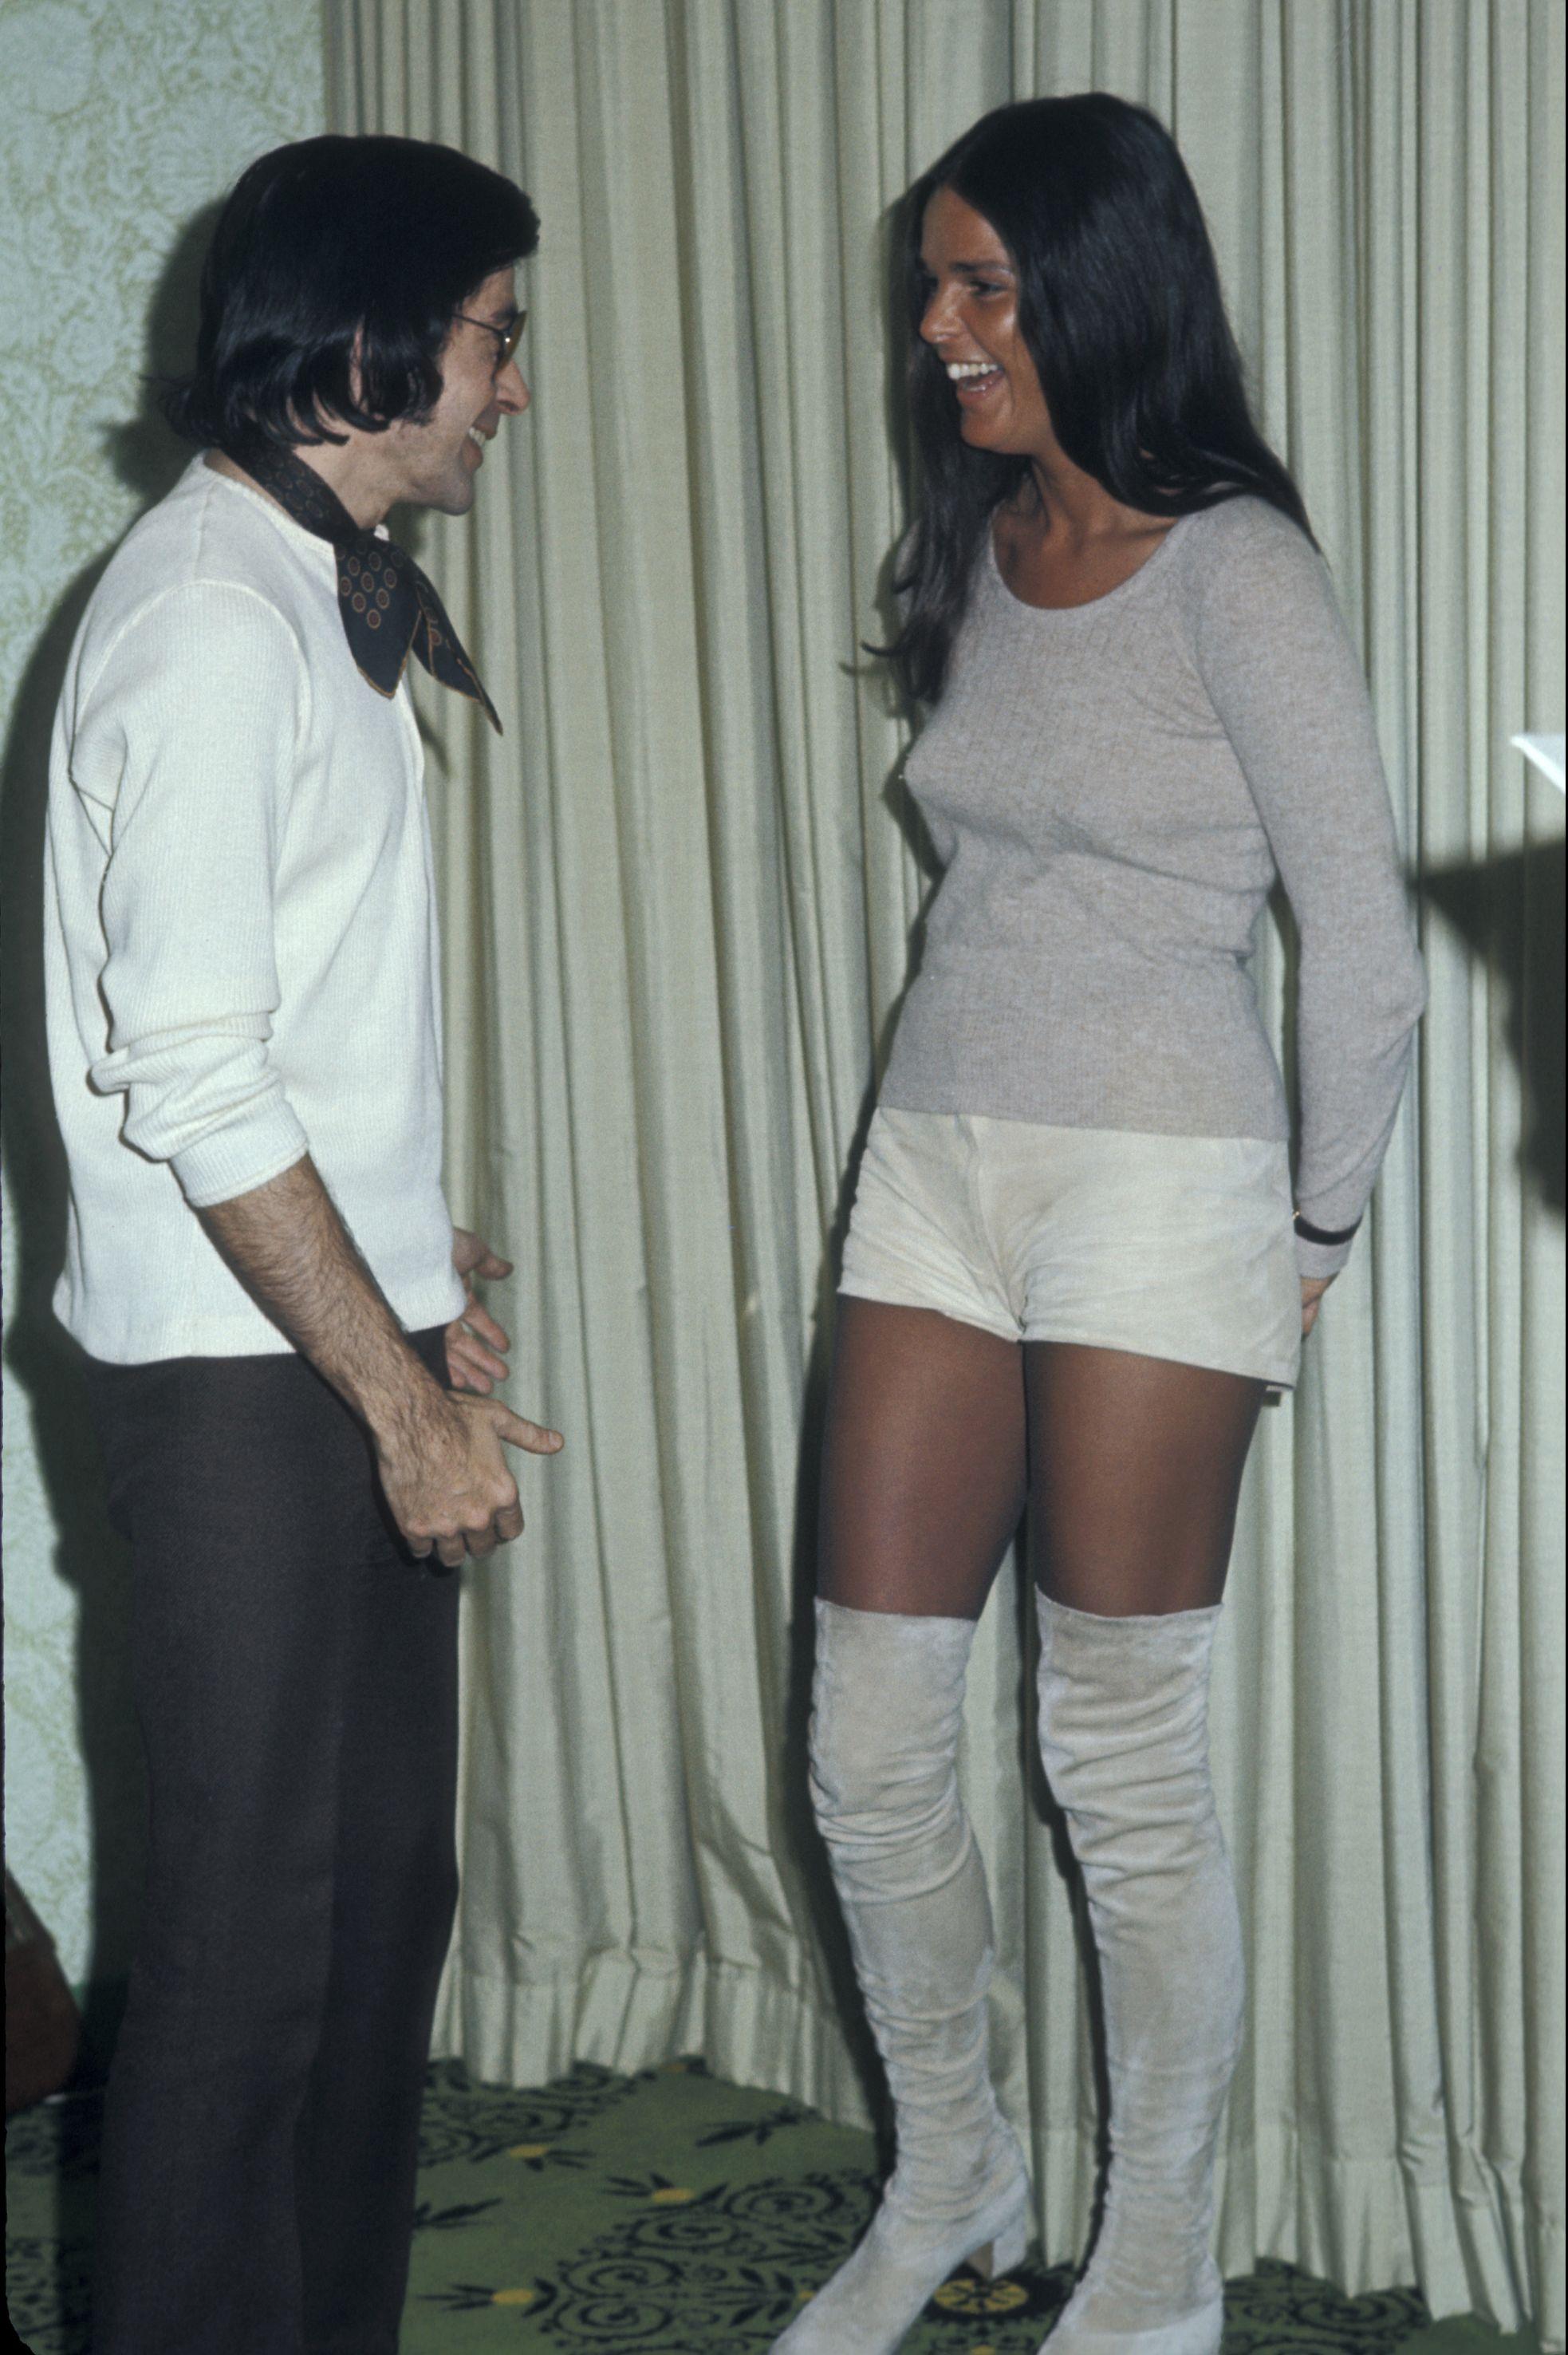 1970: Knee-High Boots